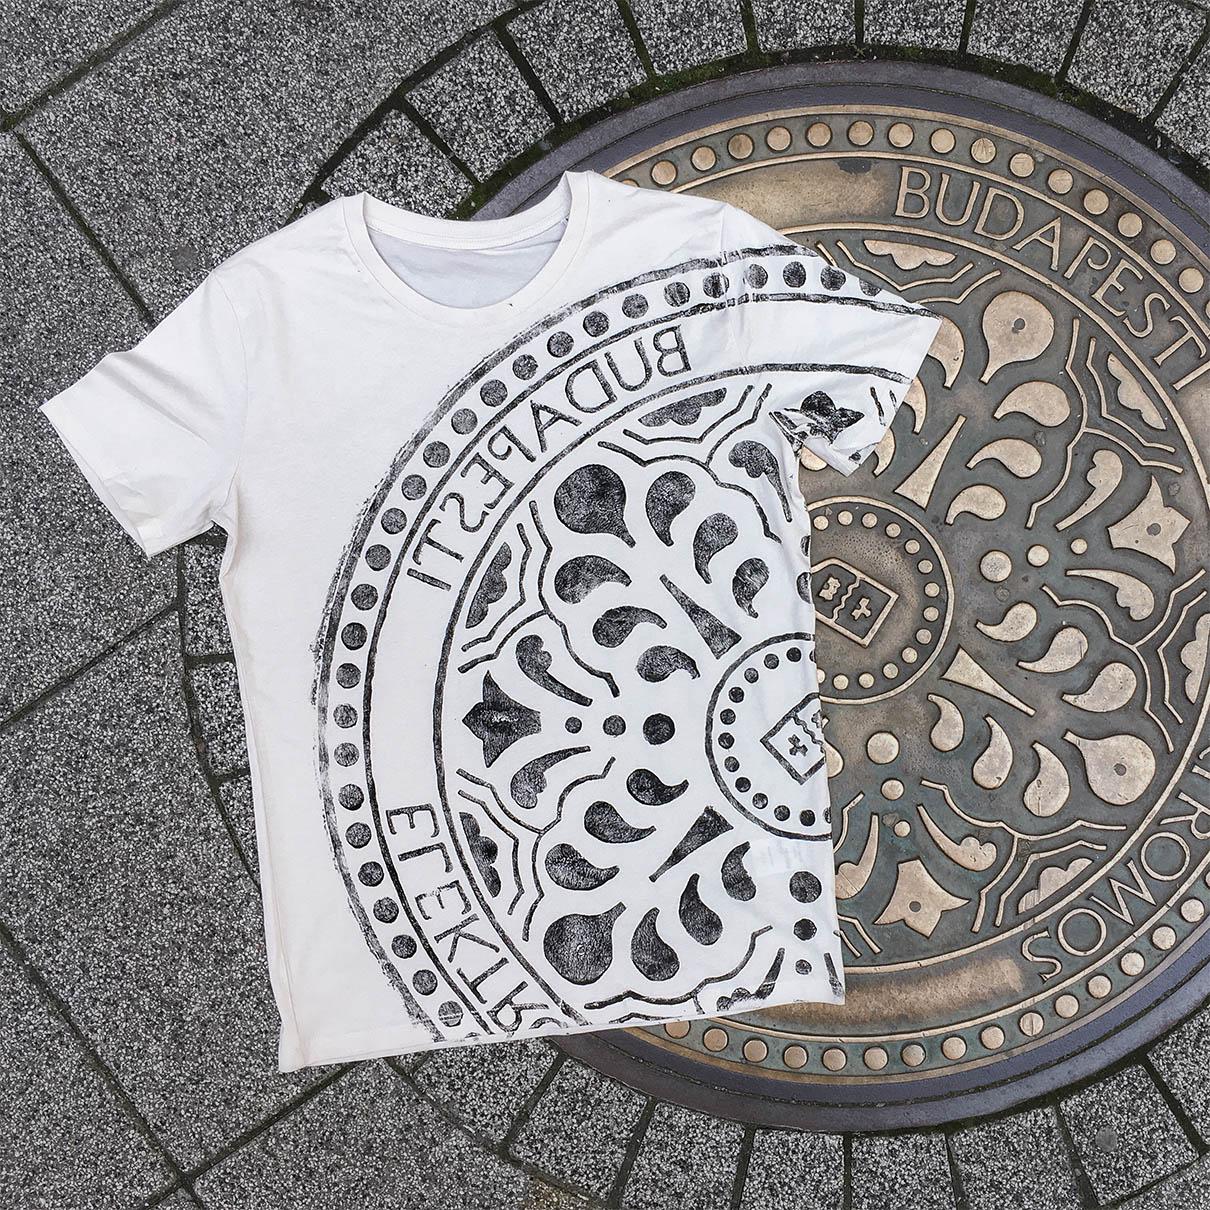 raubdruckerin_budapest_elektromos_t-shirt